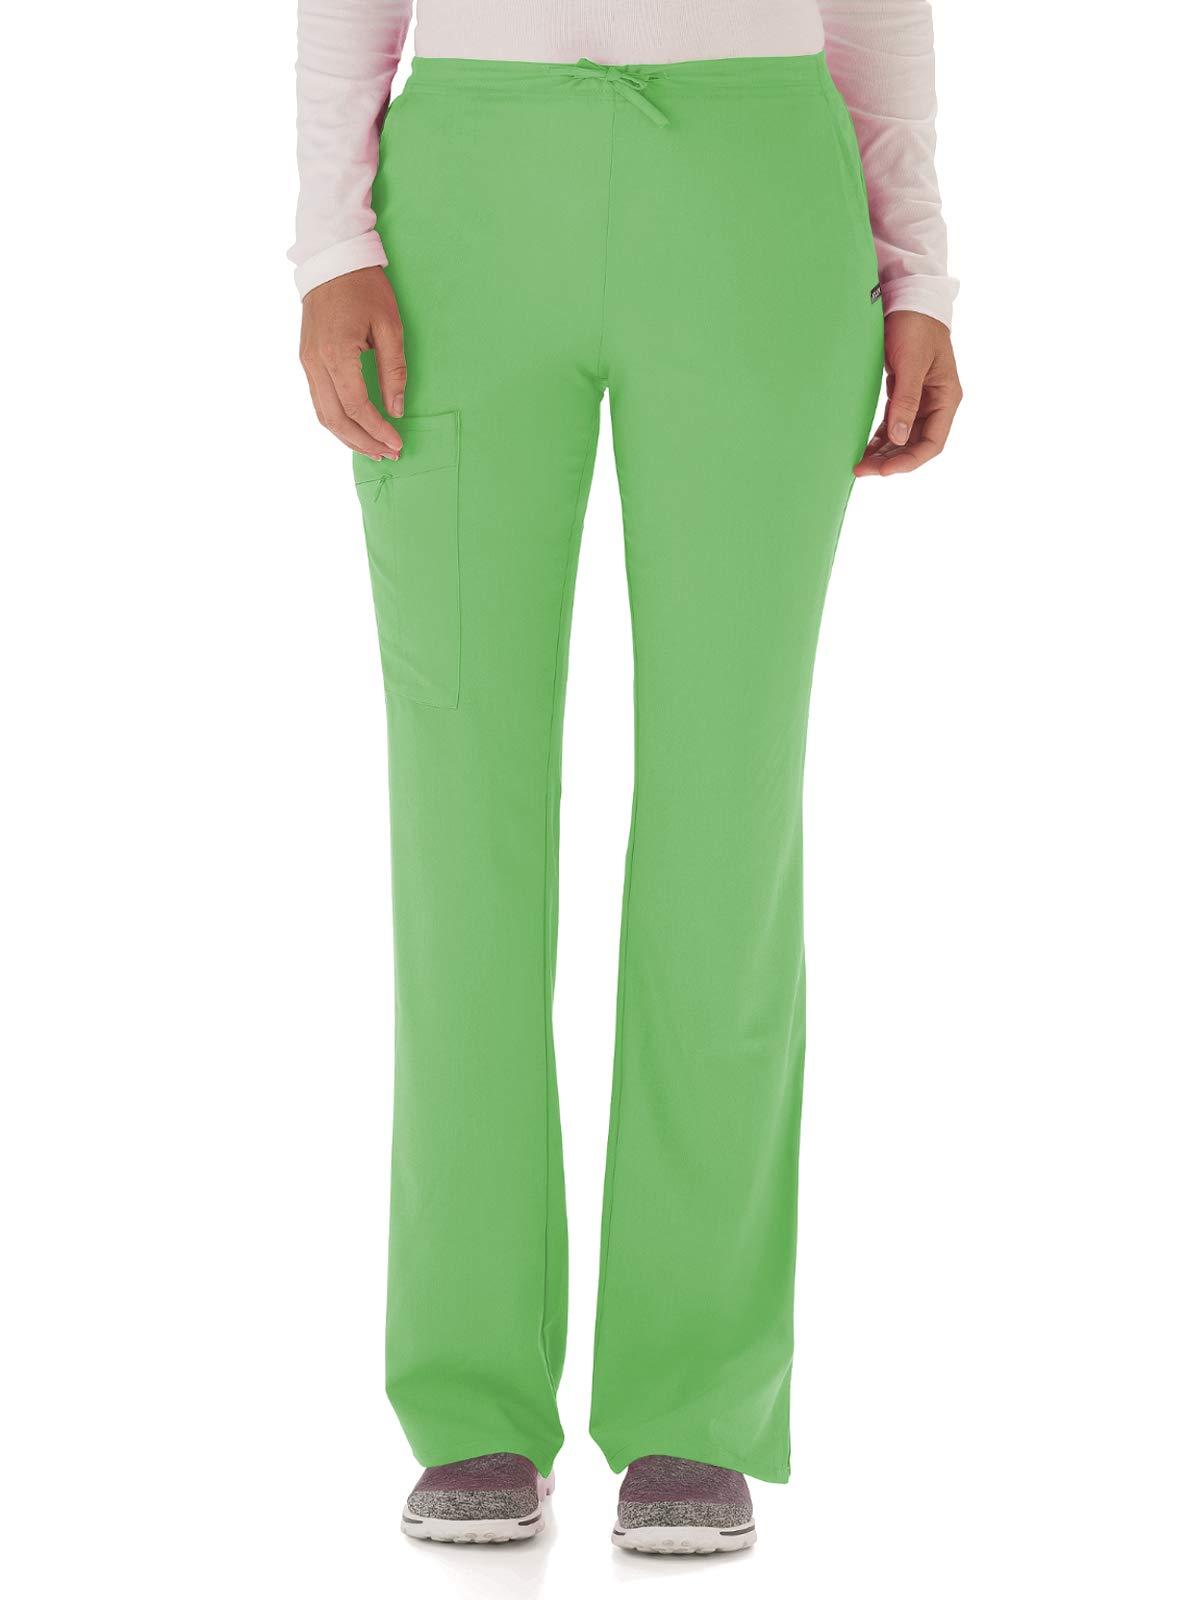 Jockey 2249 Women's Scrub Pant - Comfort Guaranteed Key Lime XL